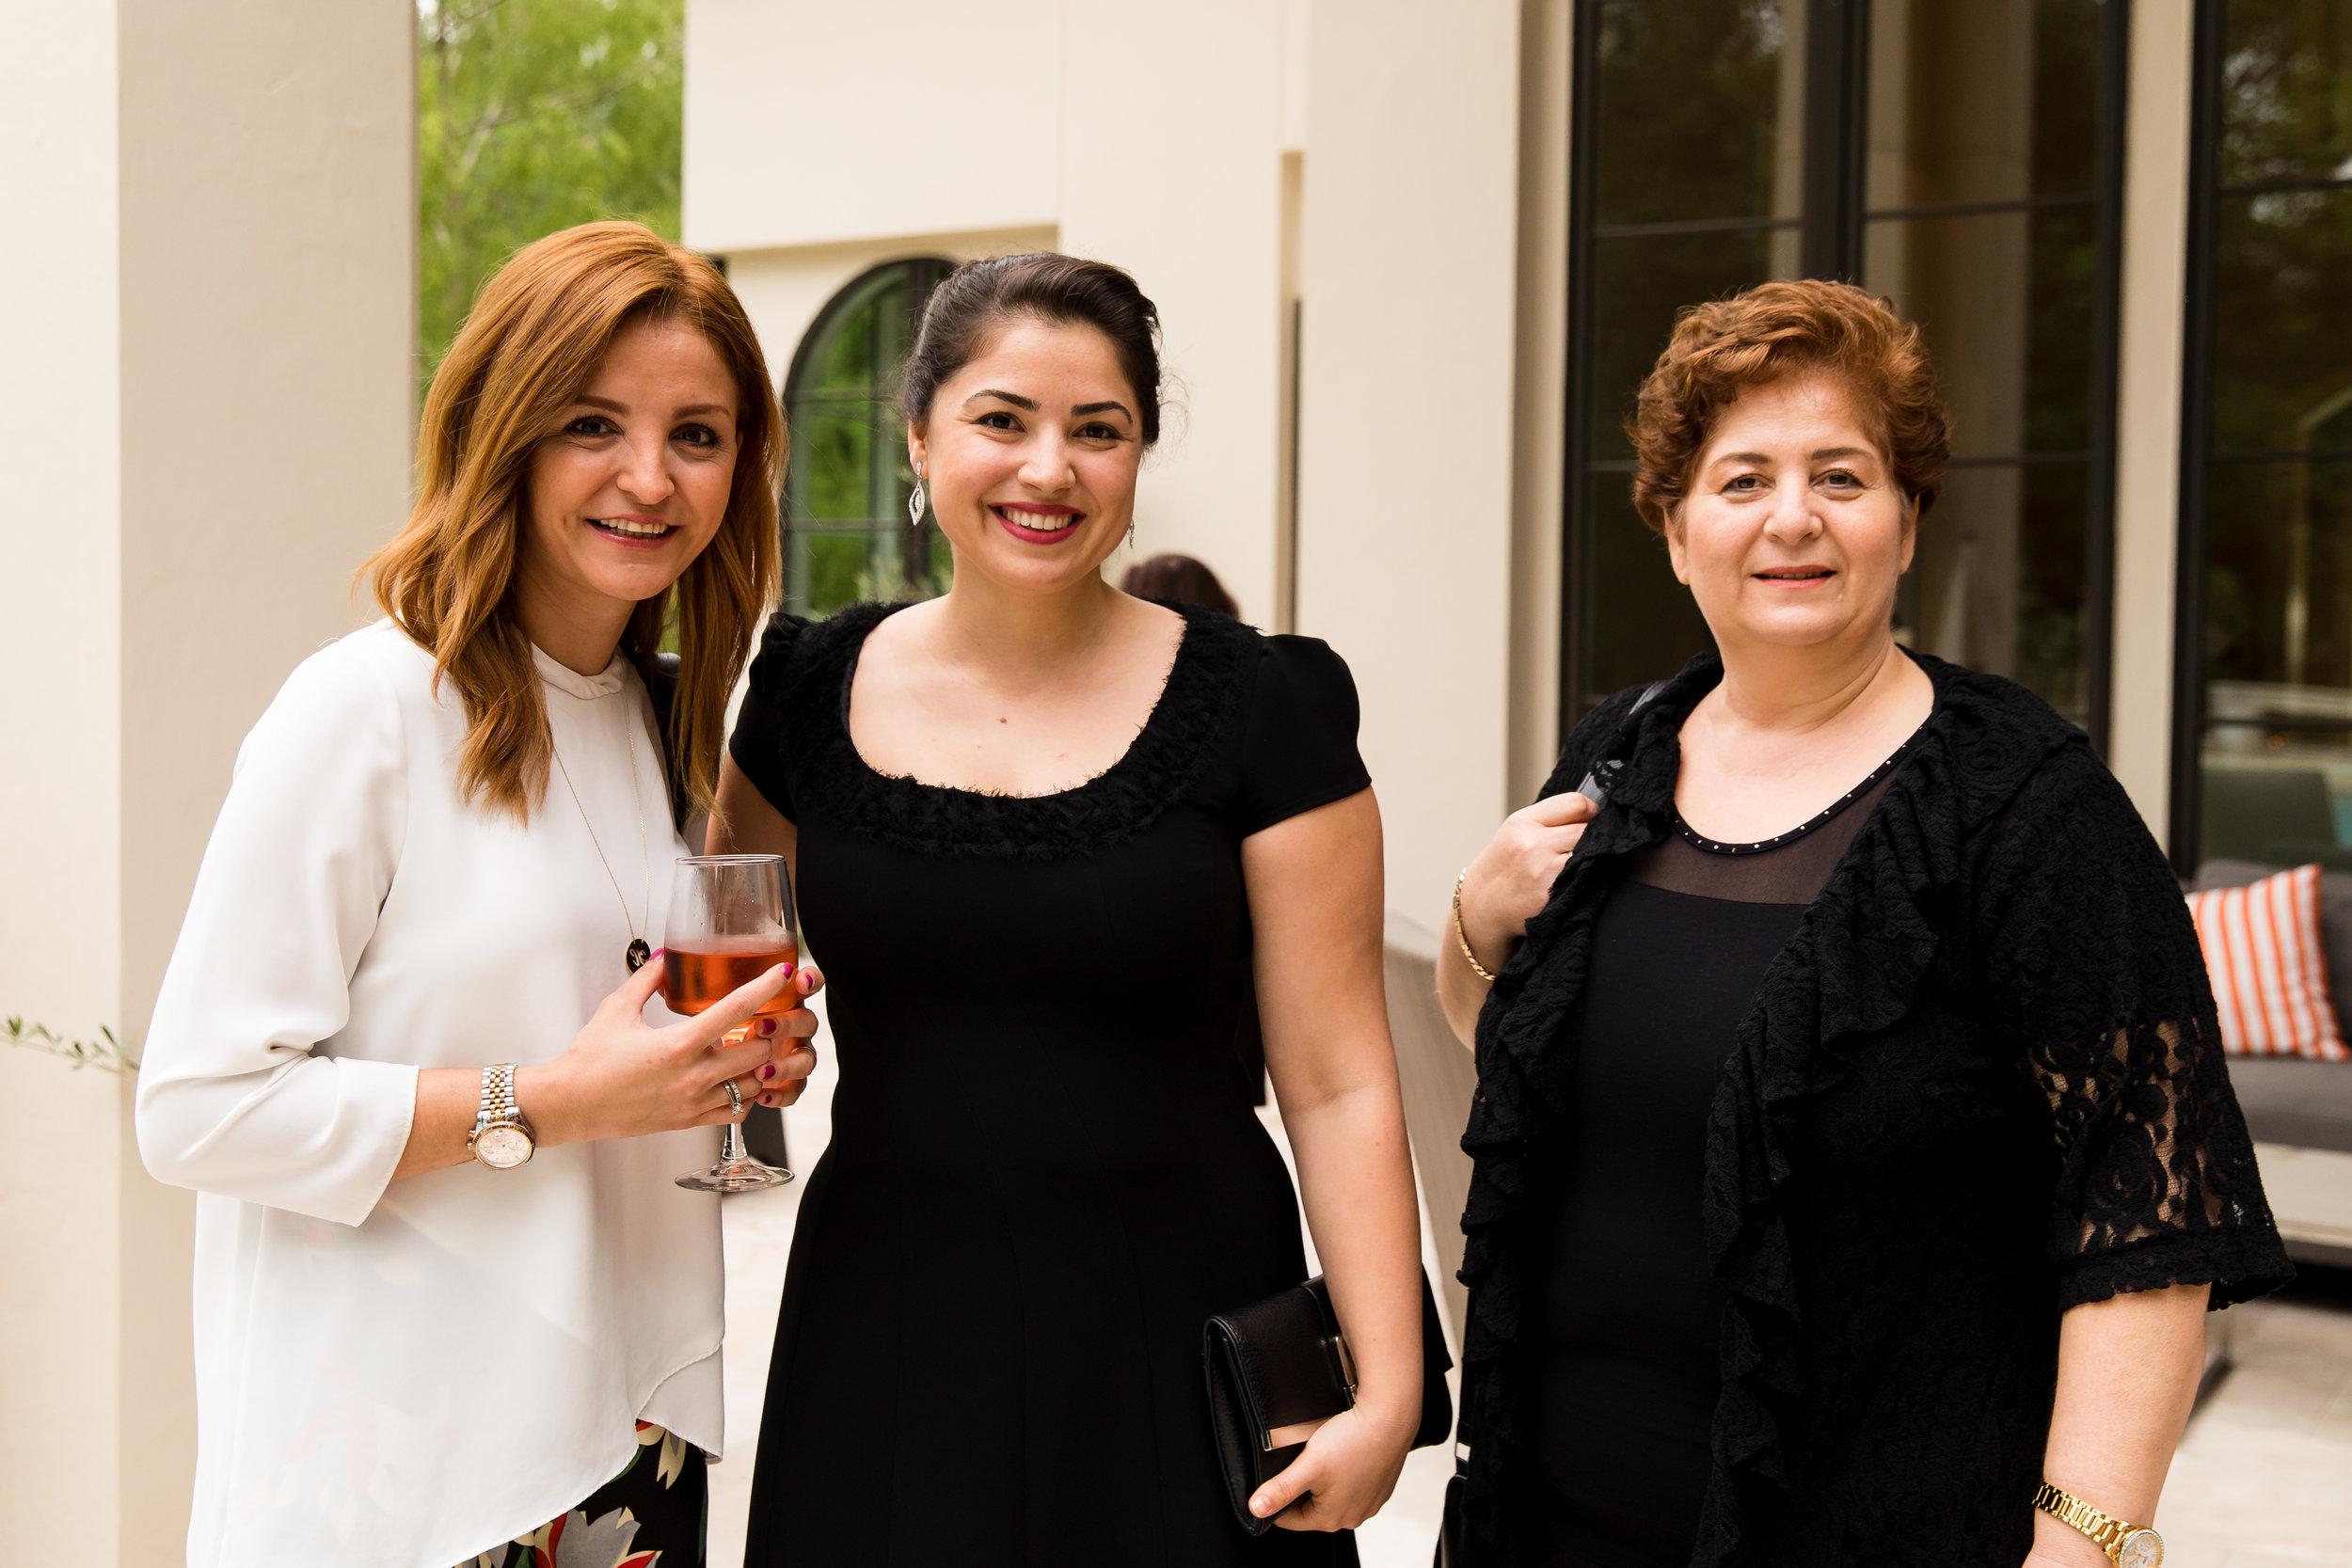 20180421-3rd Annual Education Women Turkey-169.jpg